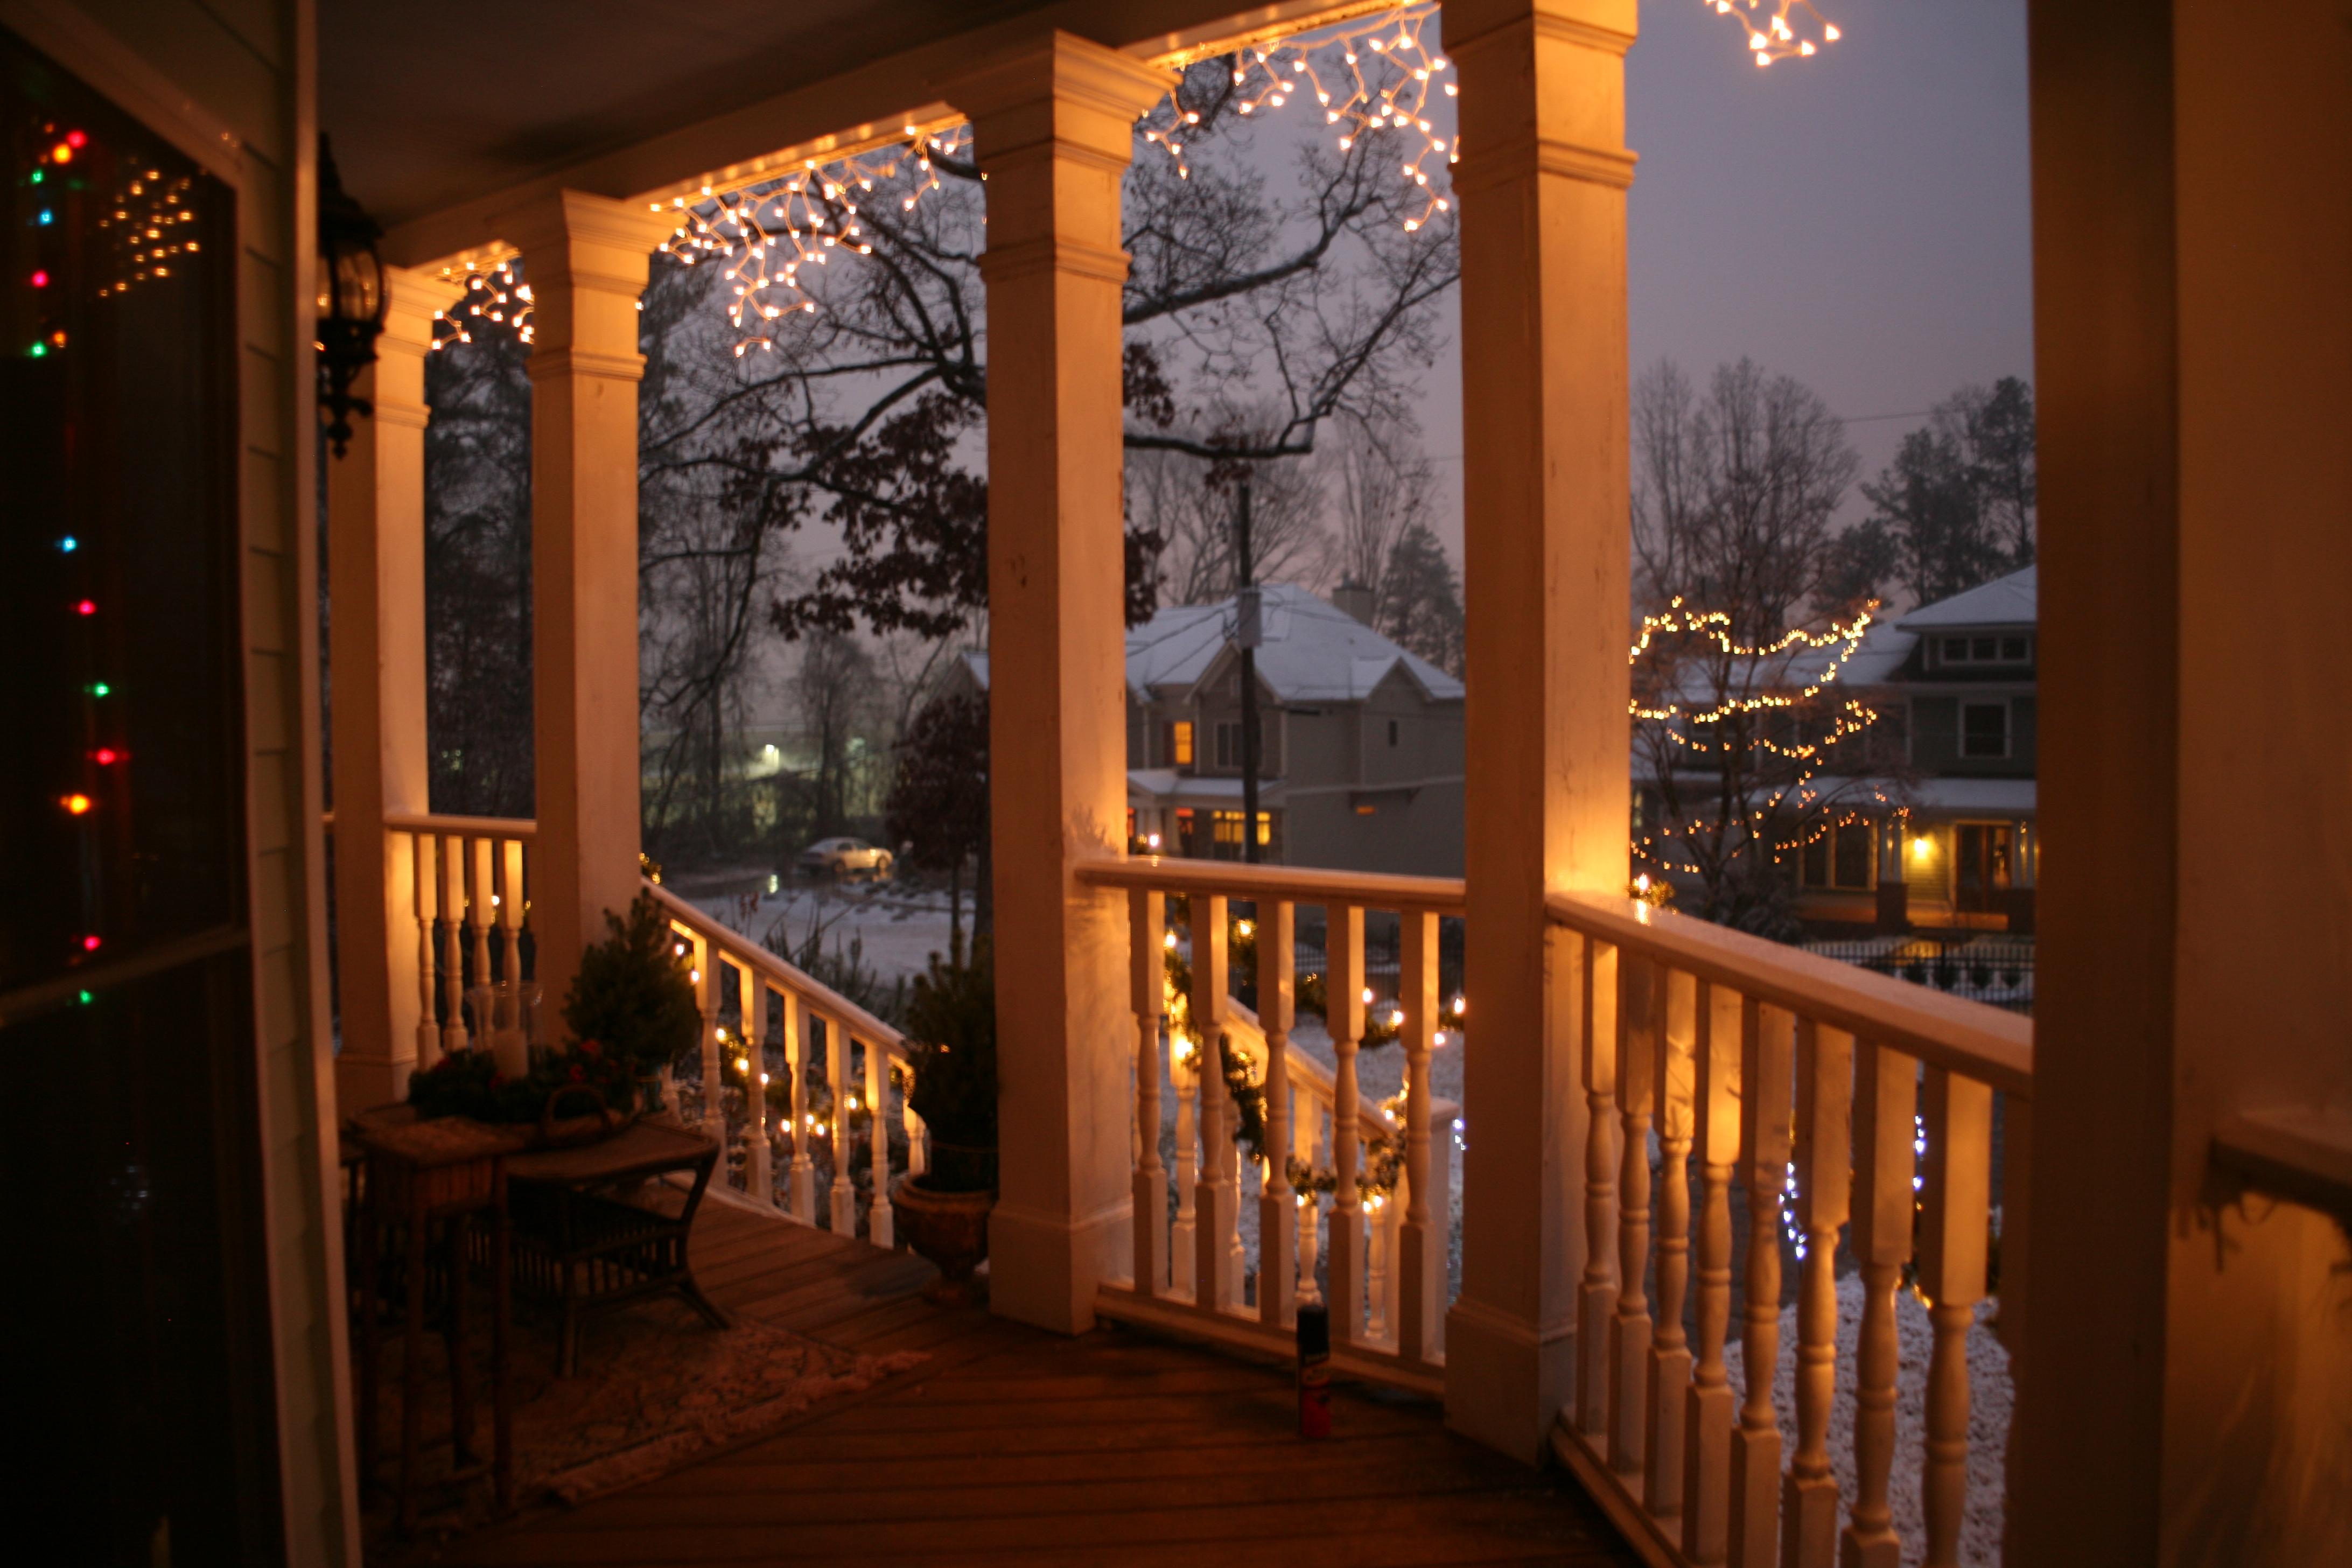 Lowcountry christmas charleston through an artist 39 s eye for Lowcountry lighting